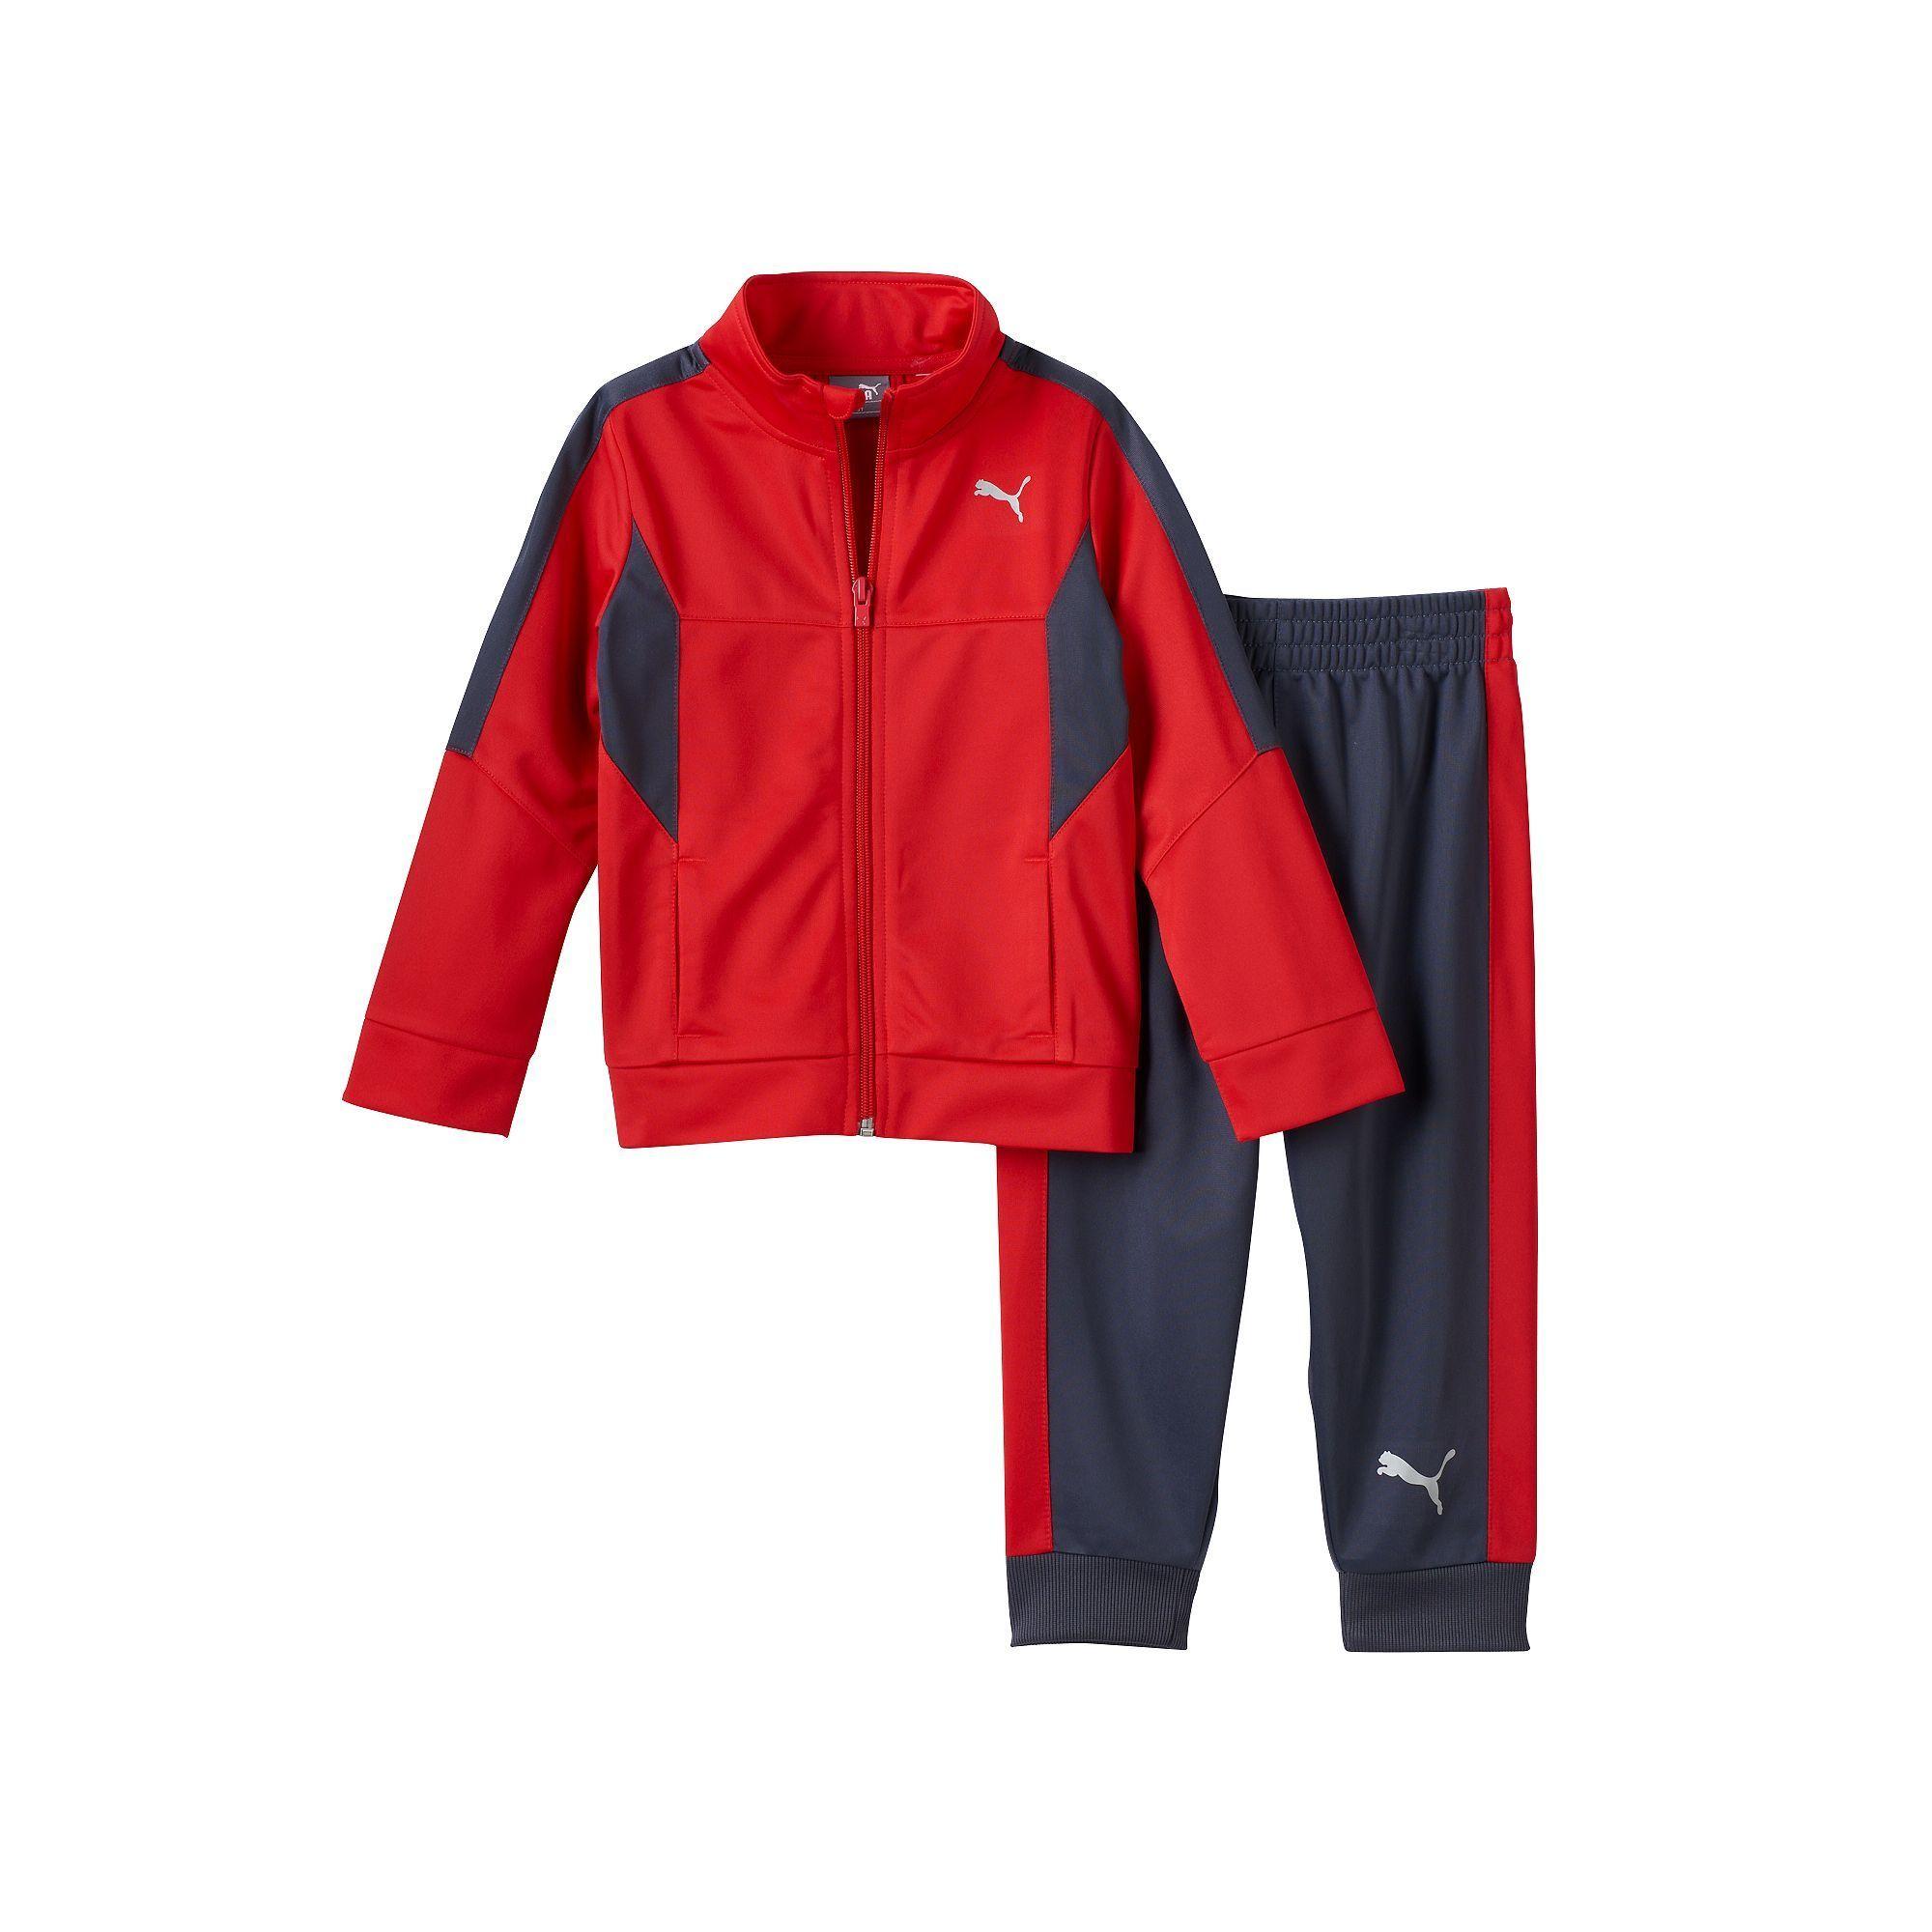 Boys 4-7 PUMA Colorblocked Track Jacket & Jogger Pants Set, Size: 4